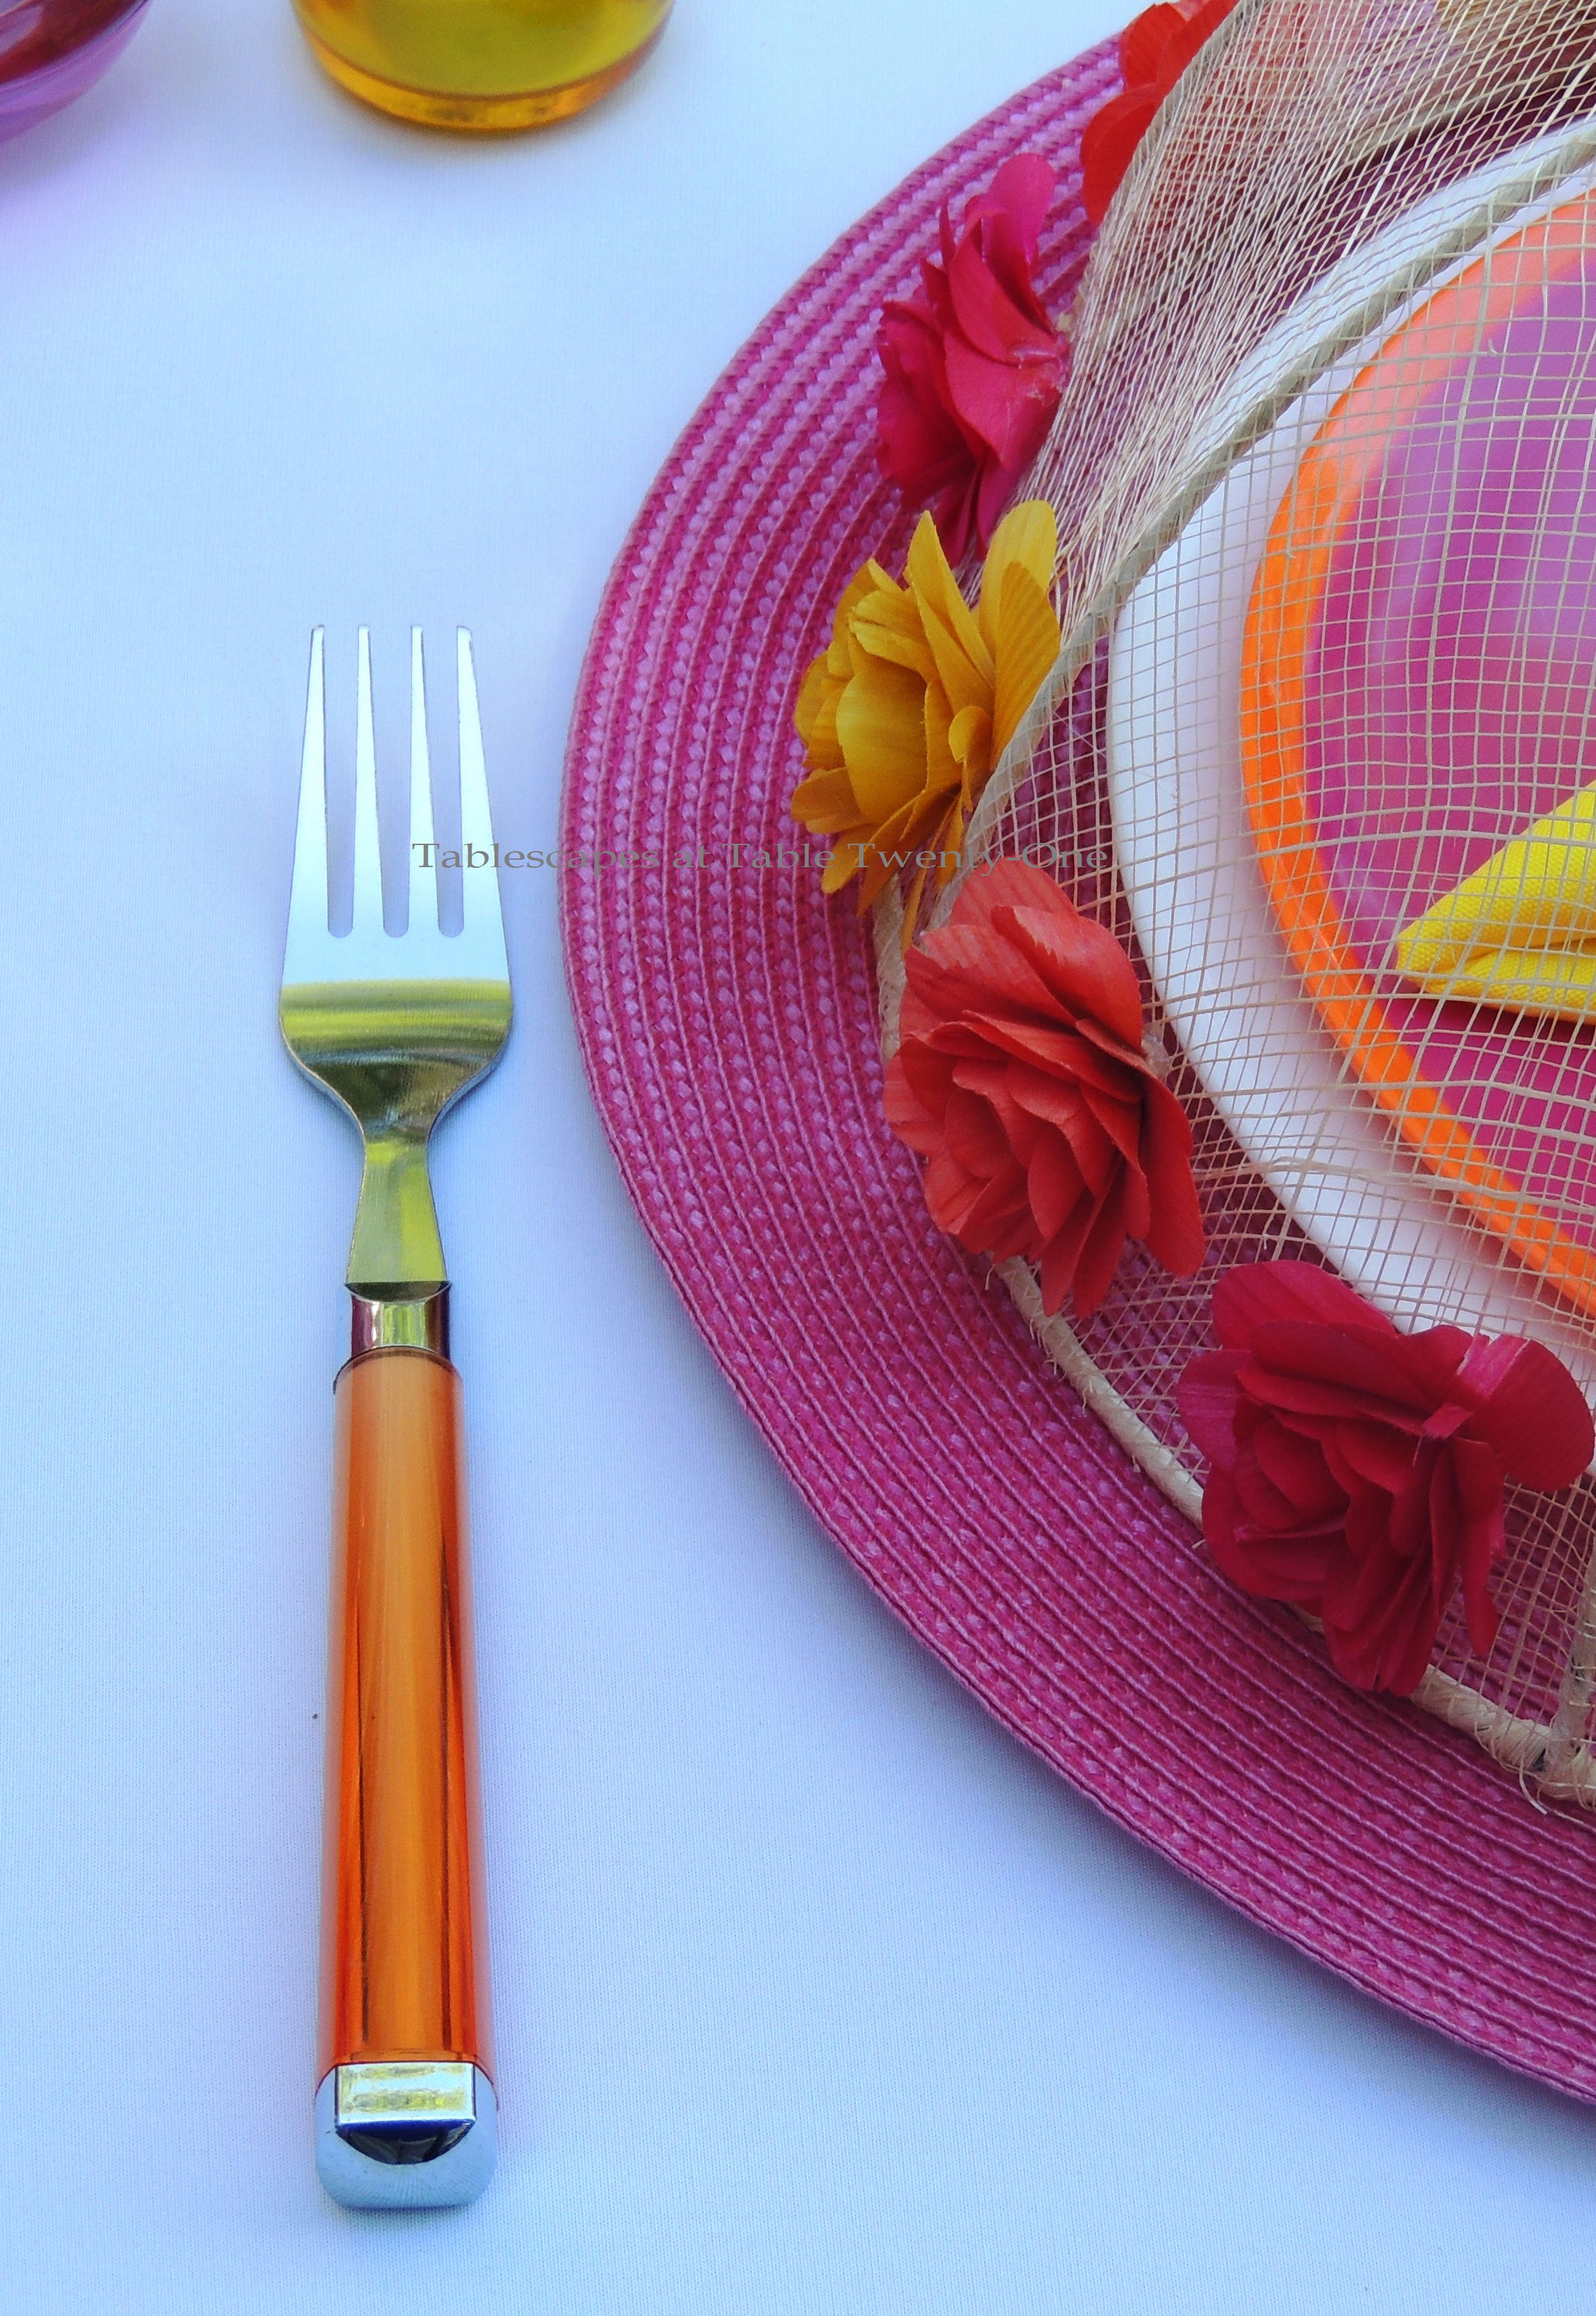 Tablescapes at Table Twenty-One, www.tabletwentyone.wordpress.com, Hot Fun in the Summertime! - orange acrylic flatware